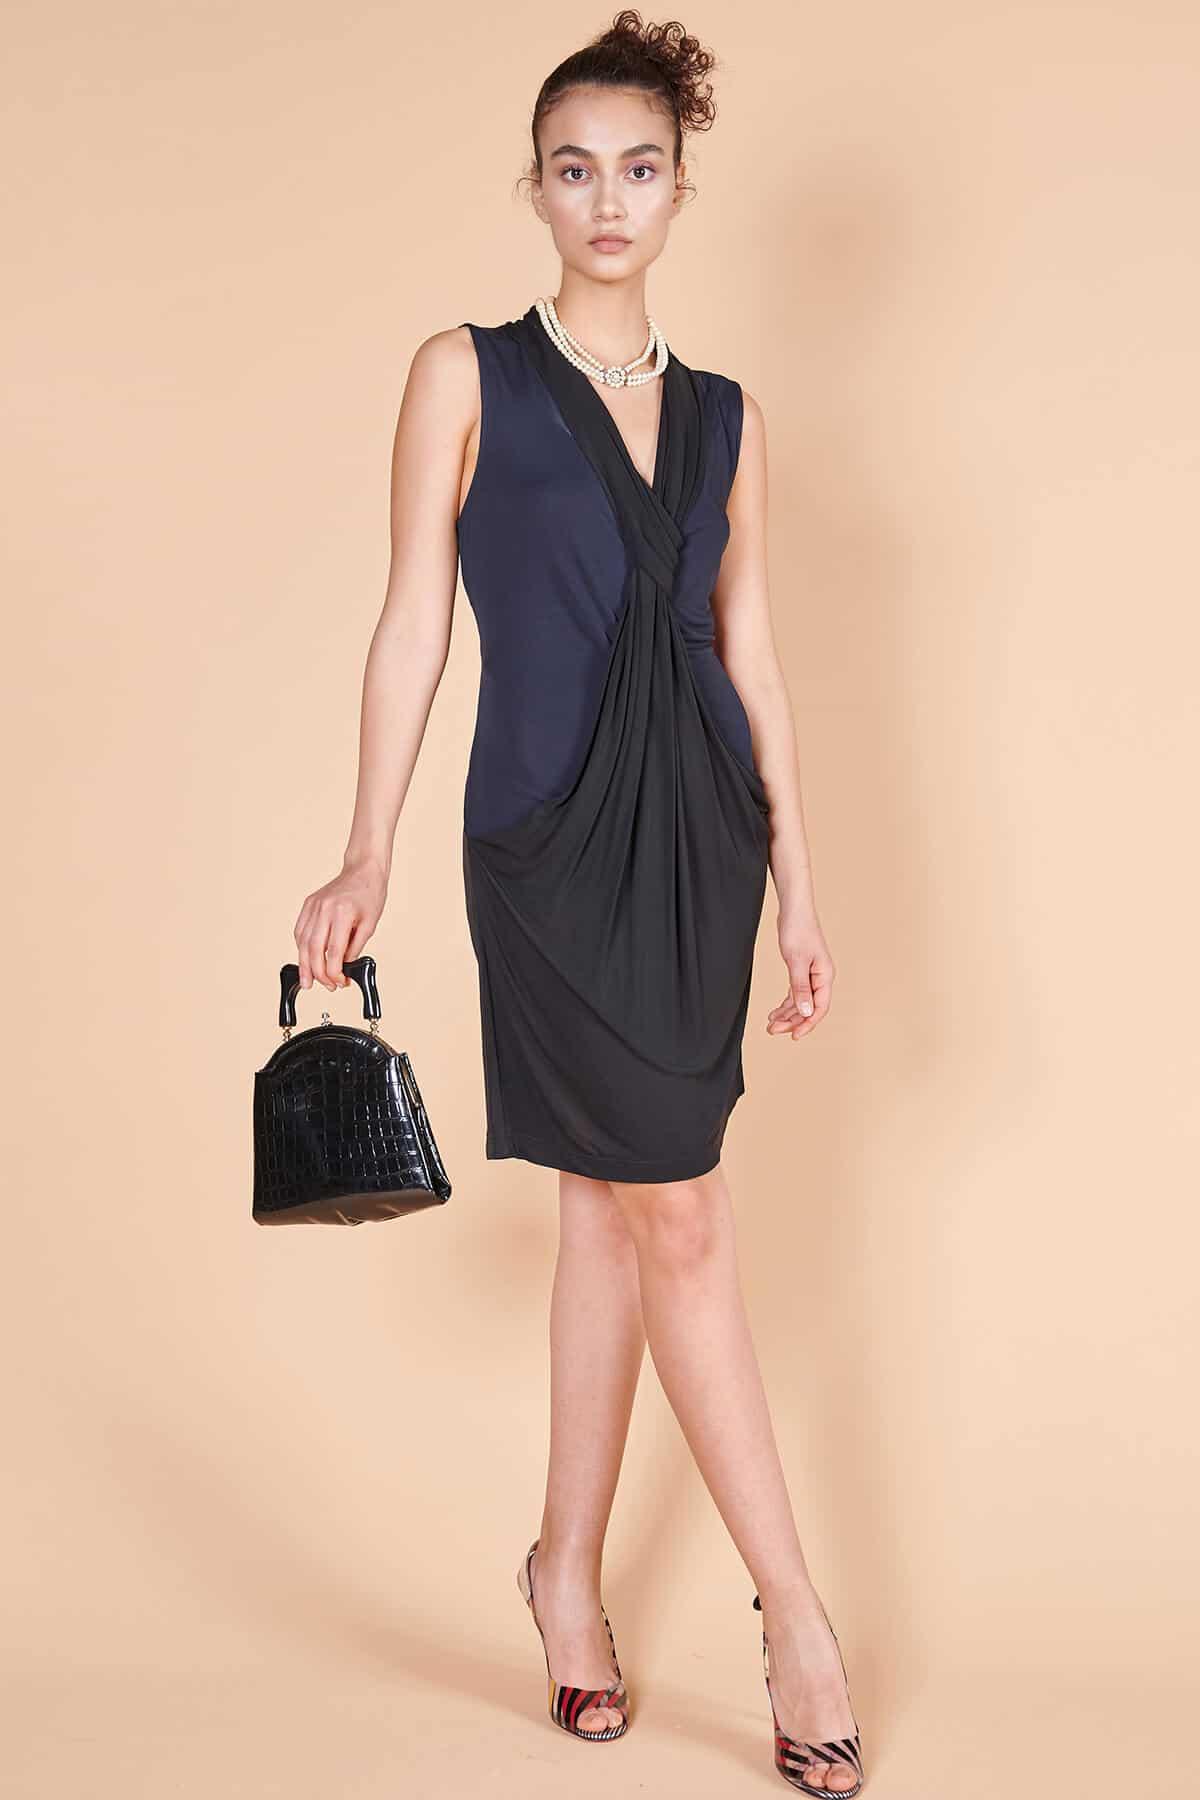 2000'ler Diane von Furstenberg siyah jarse diz üstü elbise